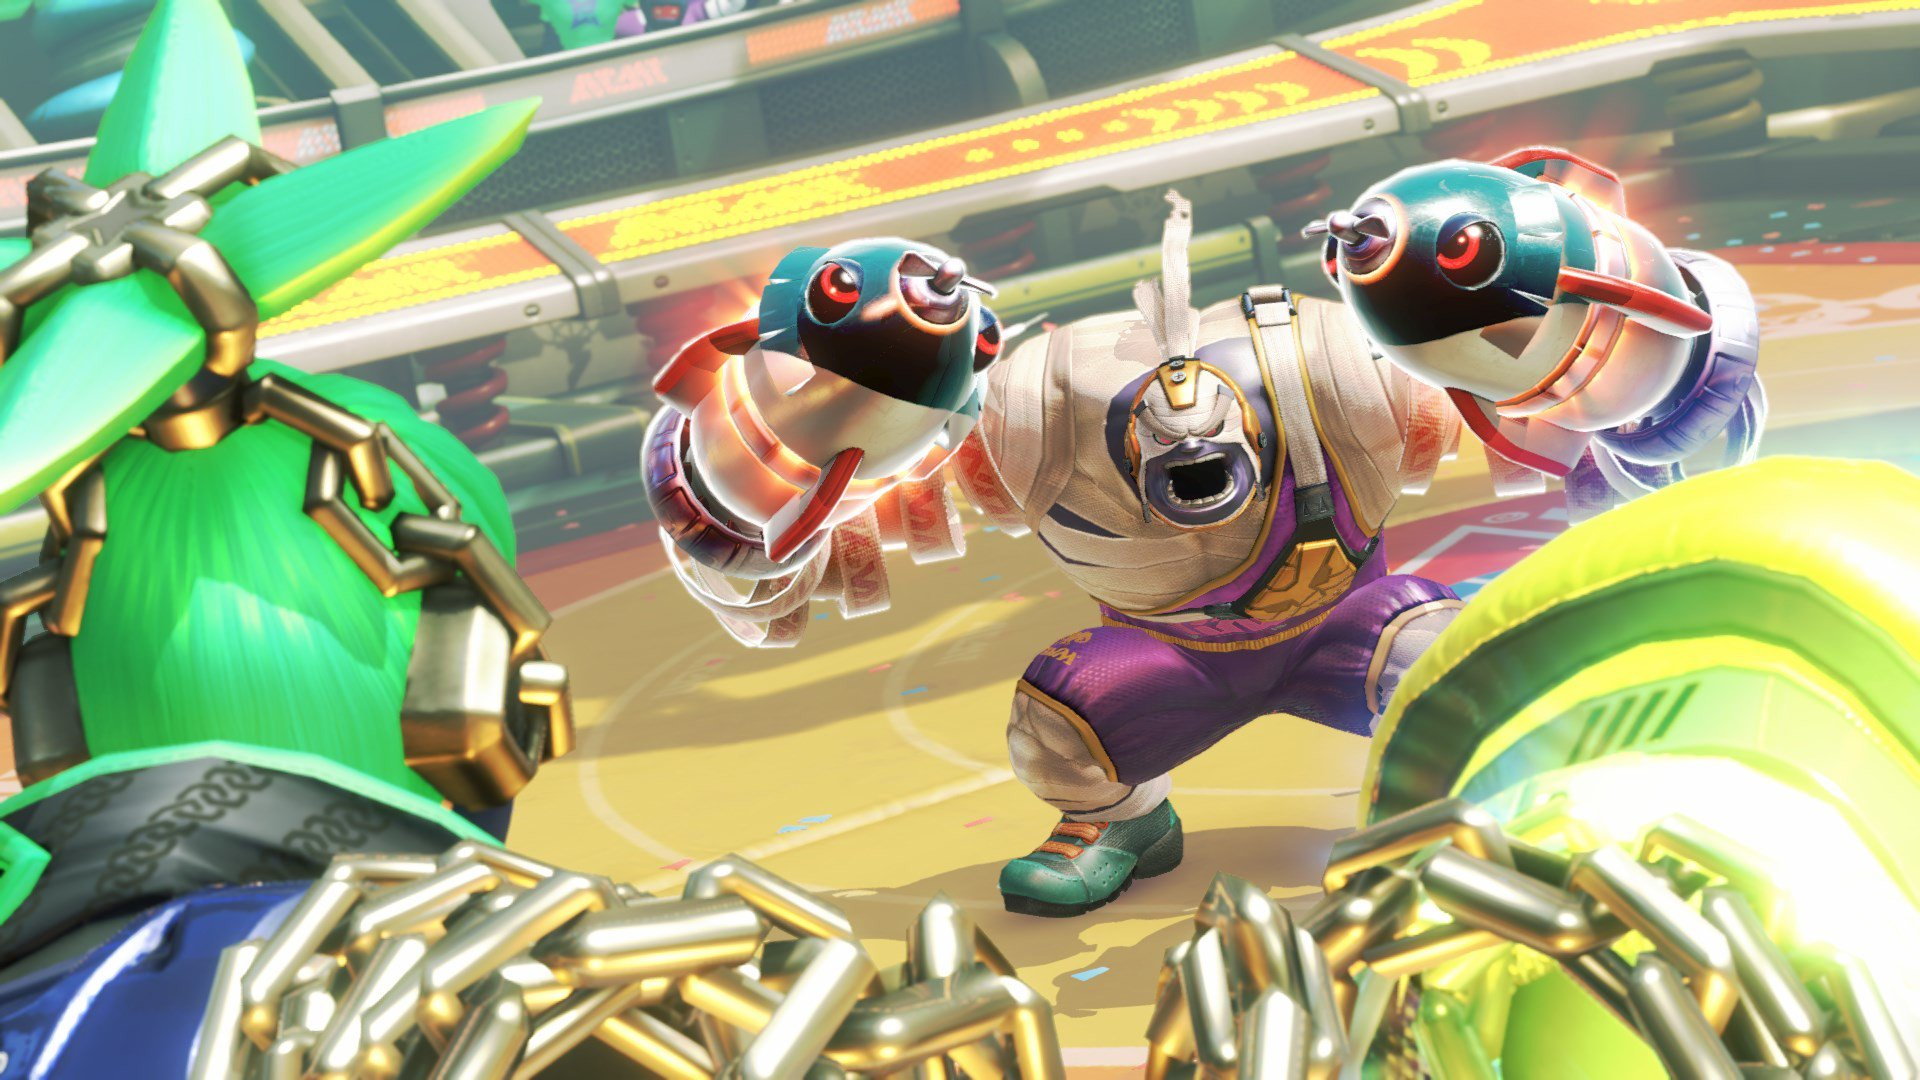 Nintendo Download: Arms screenshot